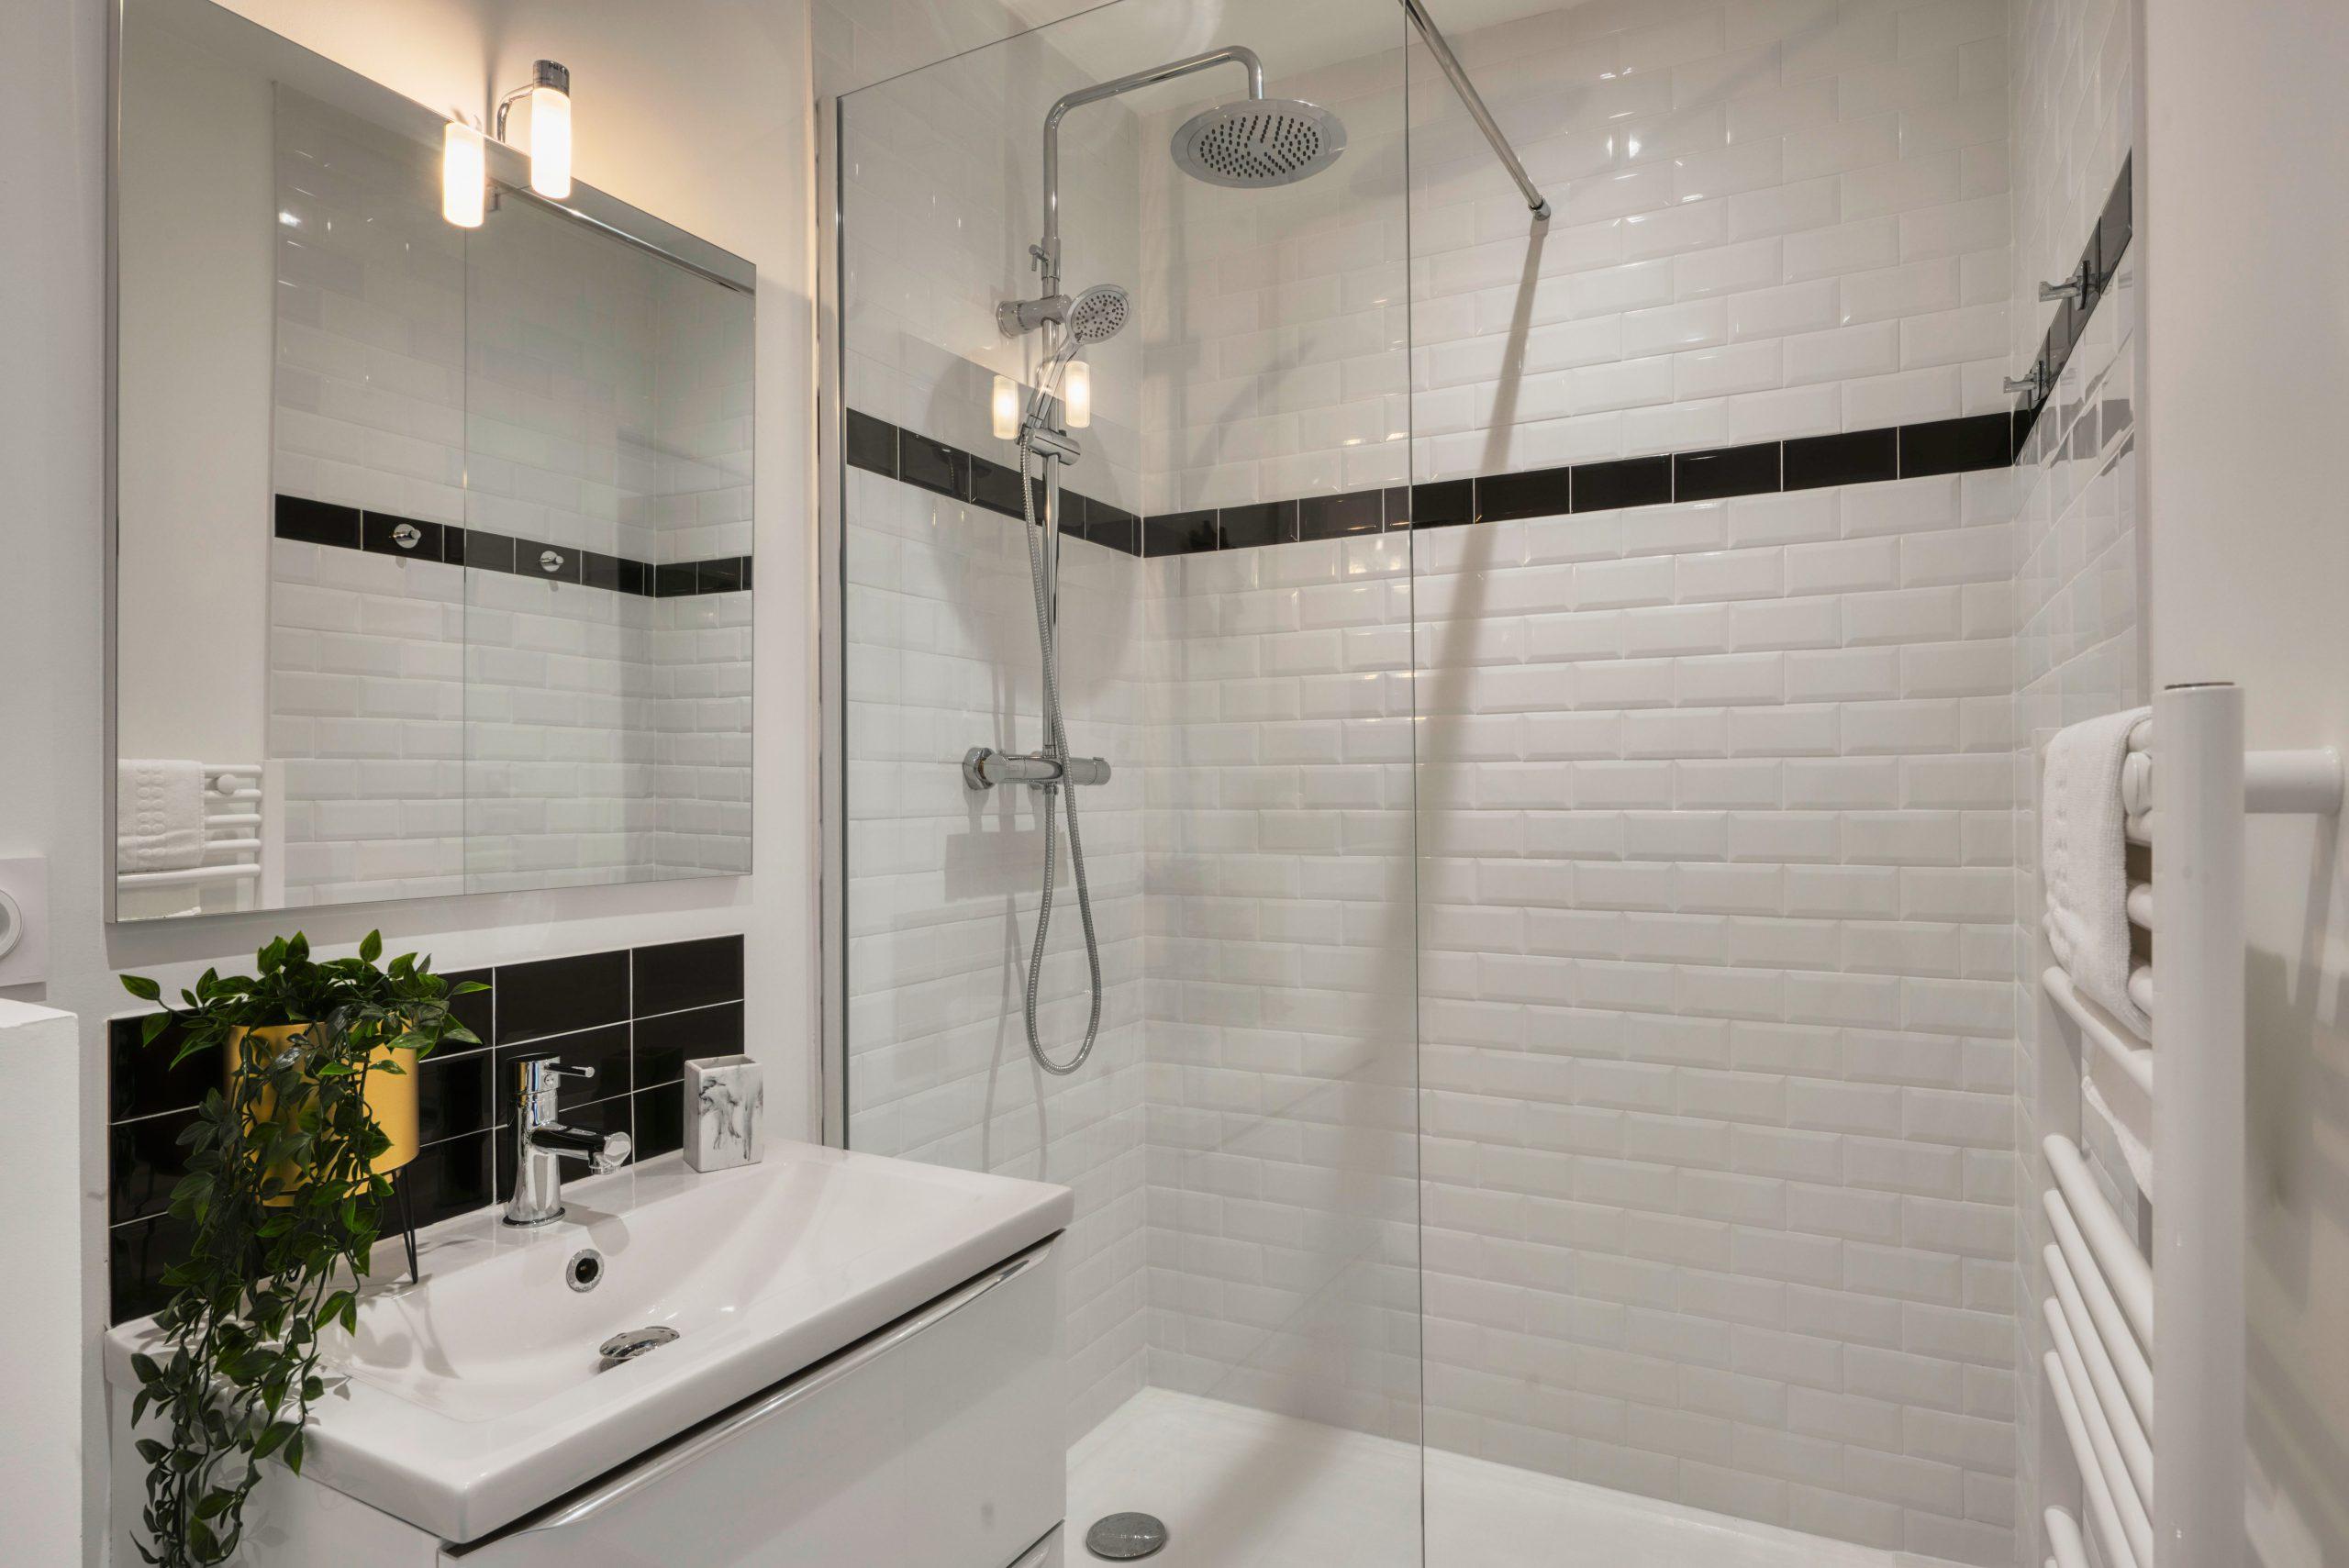 Tile Refinishing Chicago Il, Reglaze Bathroom Tile